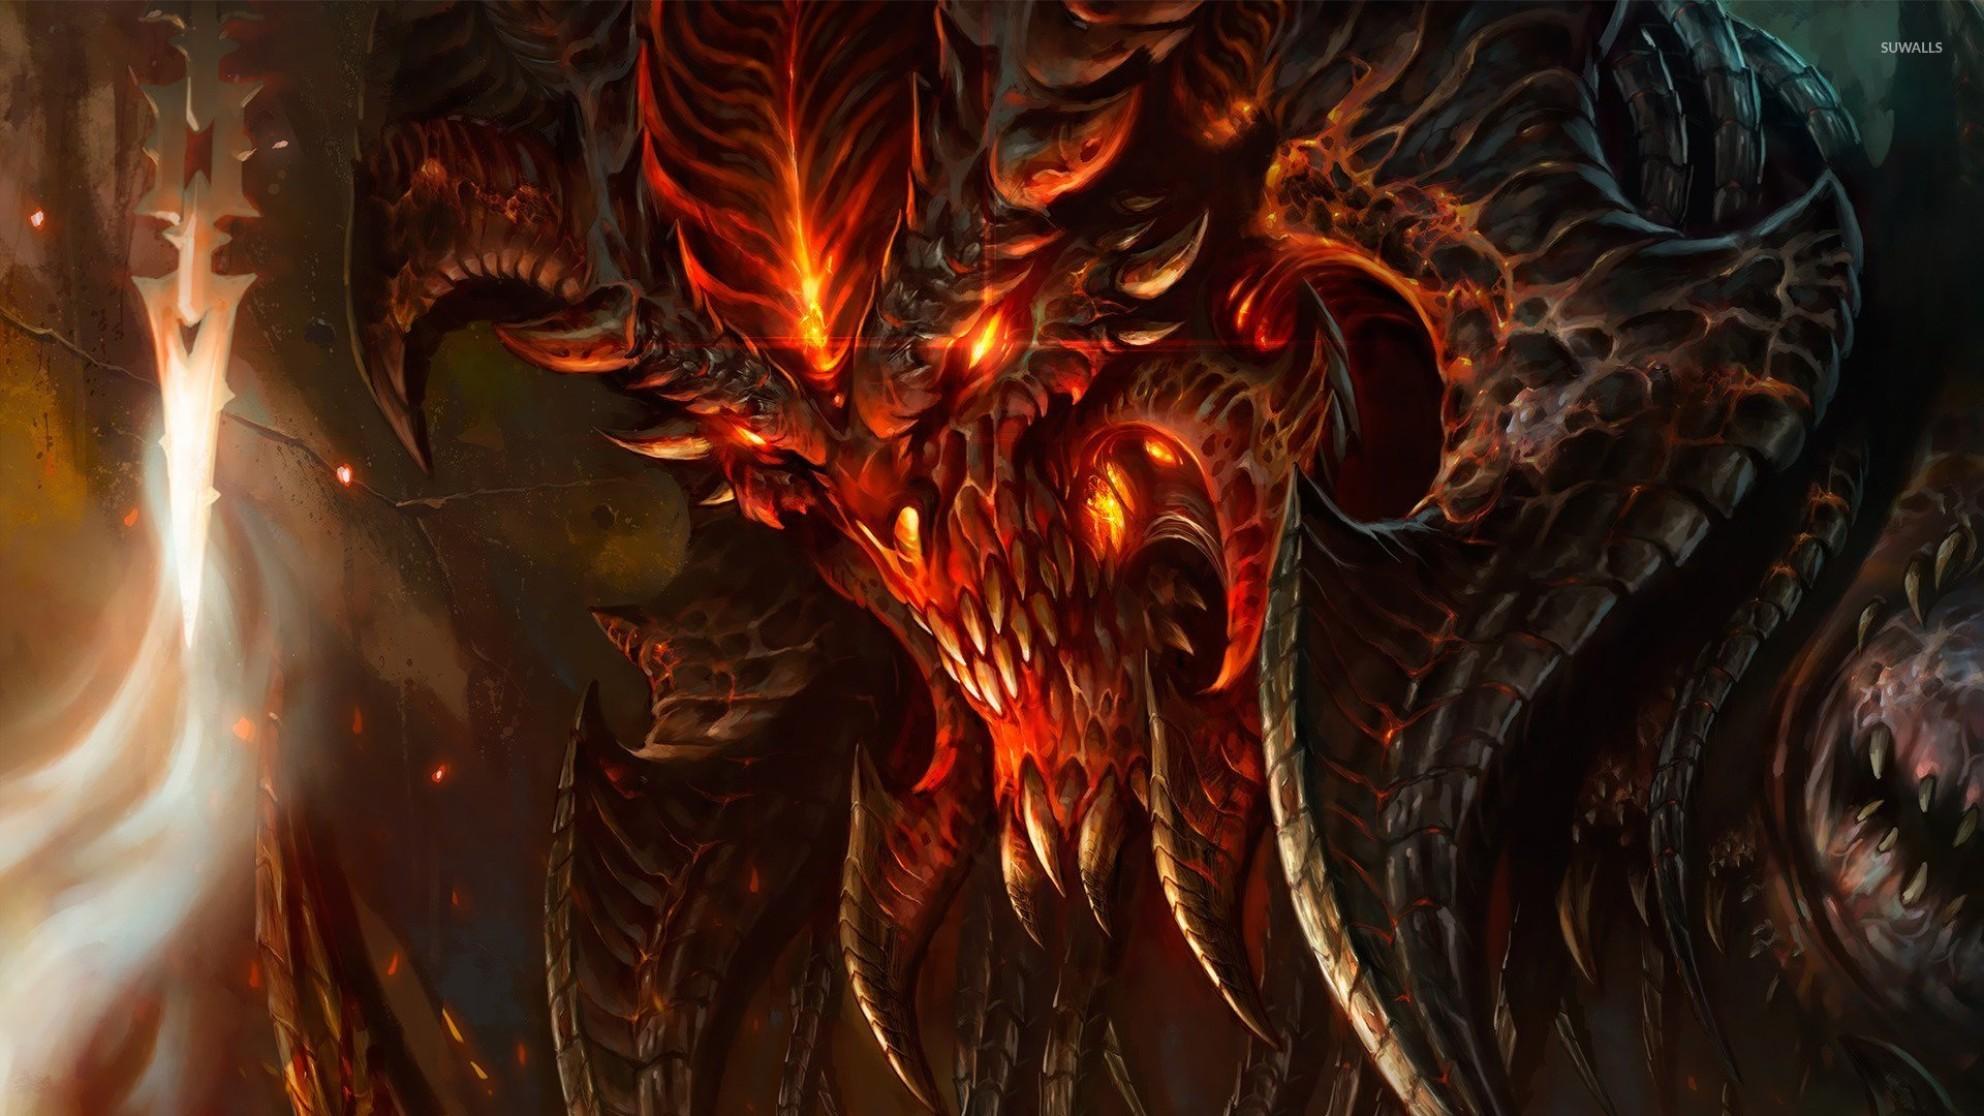 Официально: Blizzard владеет доменом Diablo4.com